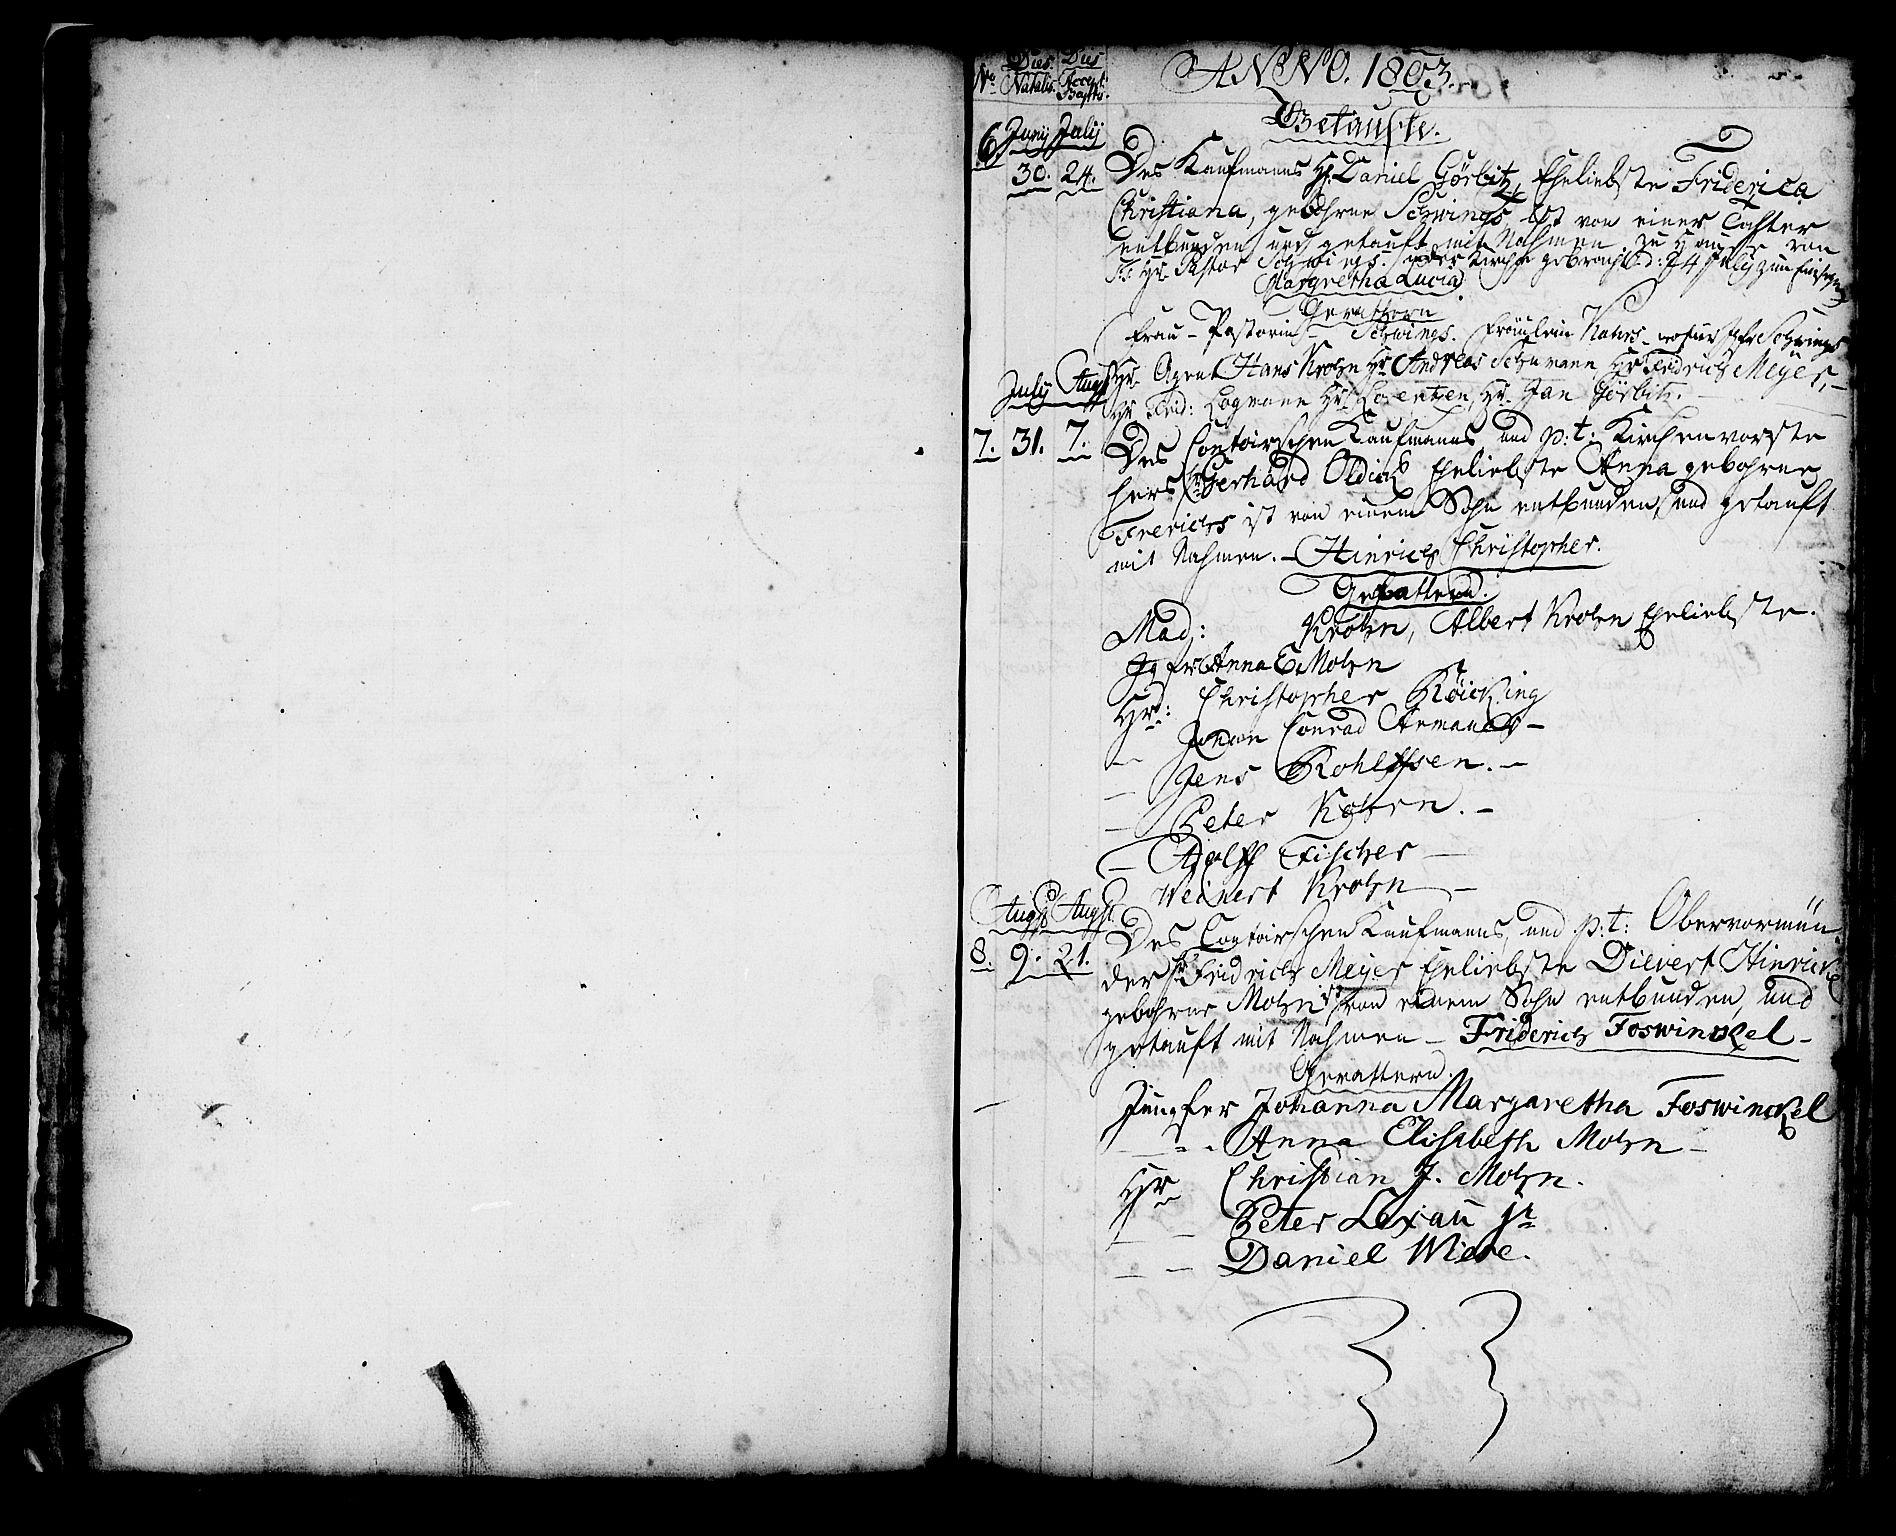 SAB, Mariakirken Sokneprestembete, H/Haa/L0002: Ministerialbok nr. A 2, 1748-1807, s. 14